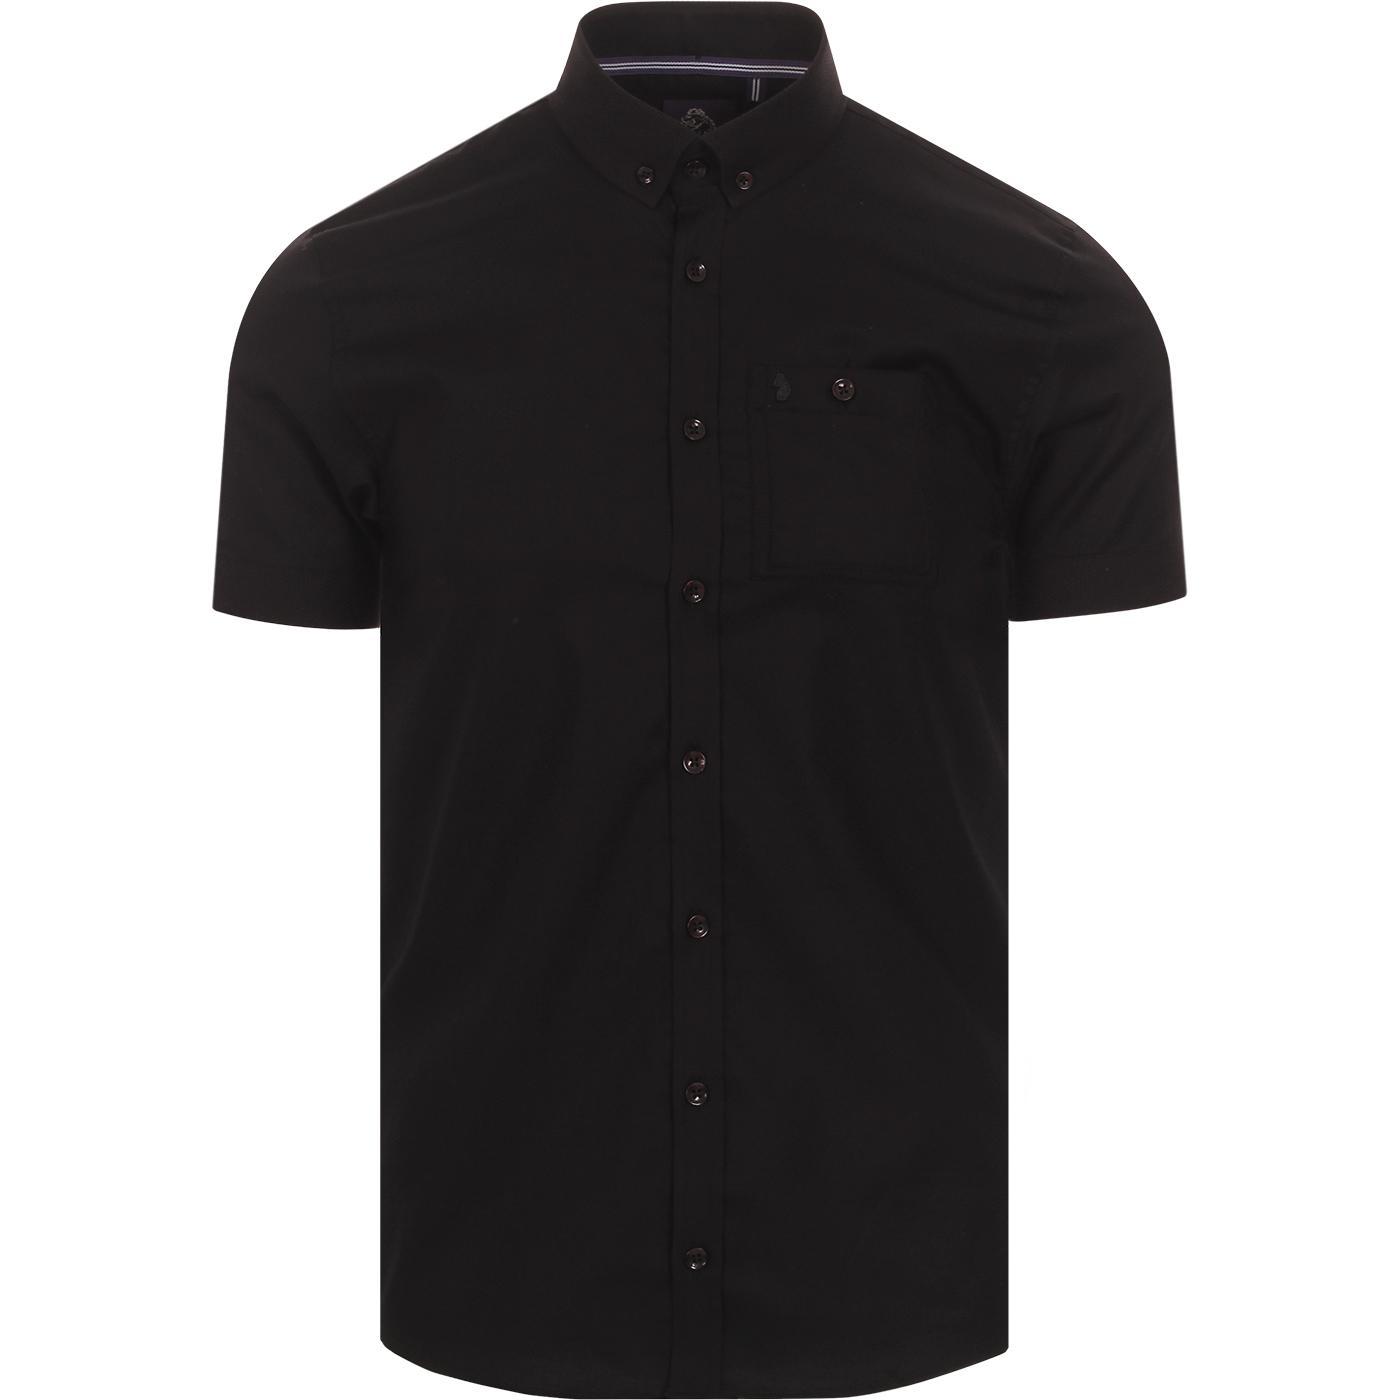 Shirts & Giggles LUKE Texture Collar Oxford Shirt